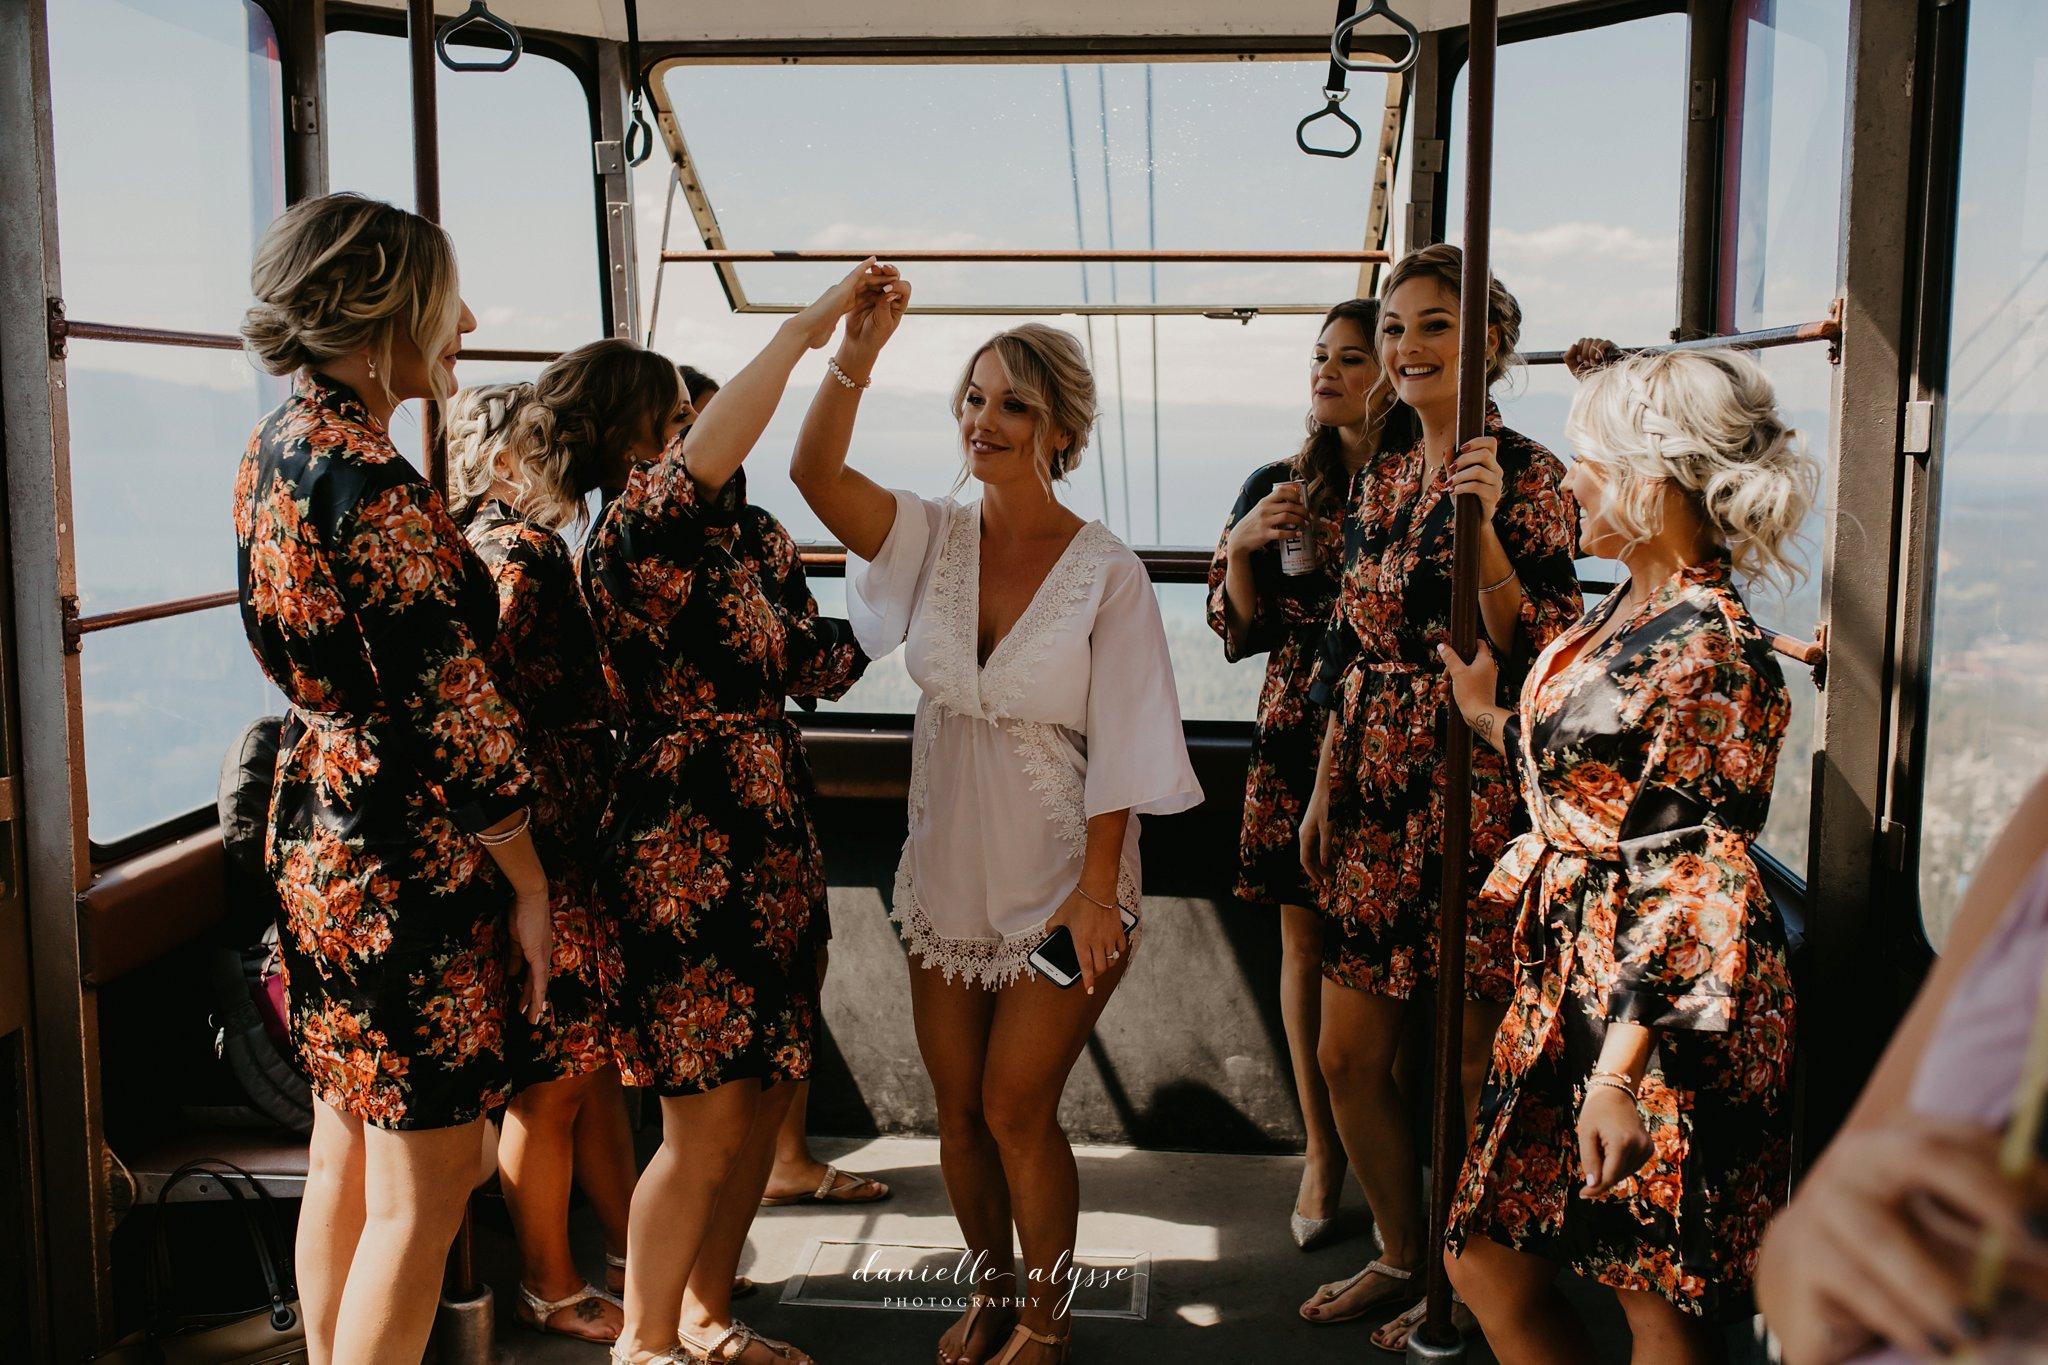 180831_wedding_stephanie_heavenly_south_lake_tahoe_danielle_alysse_photography_destination_blog_191_WEB.jpg